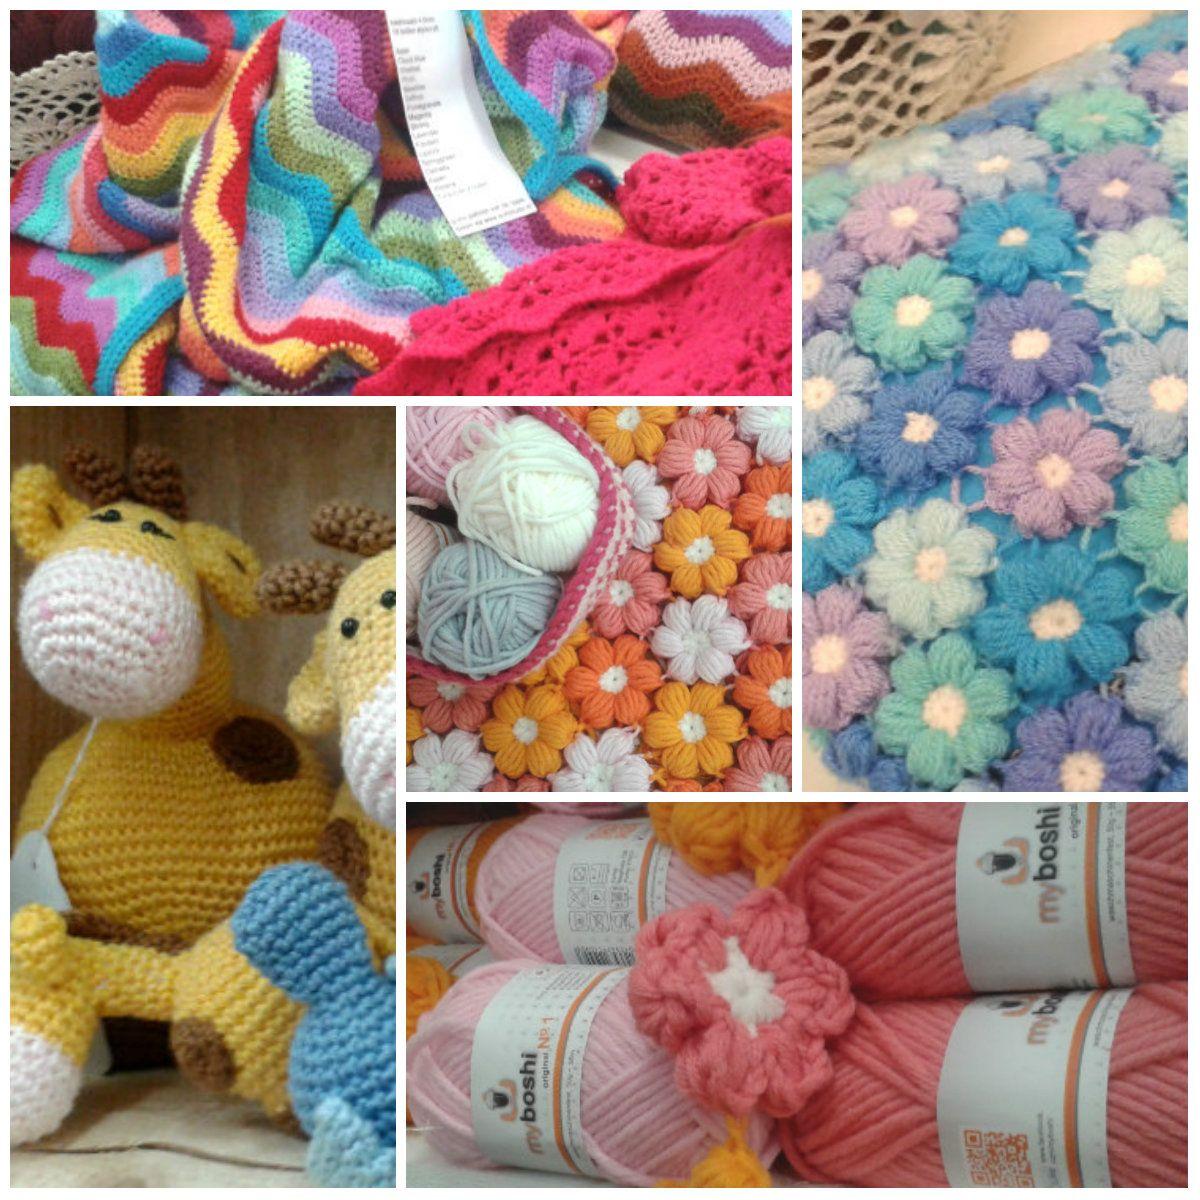 Crochet inspiration | Happy in Red